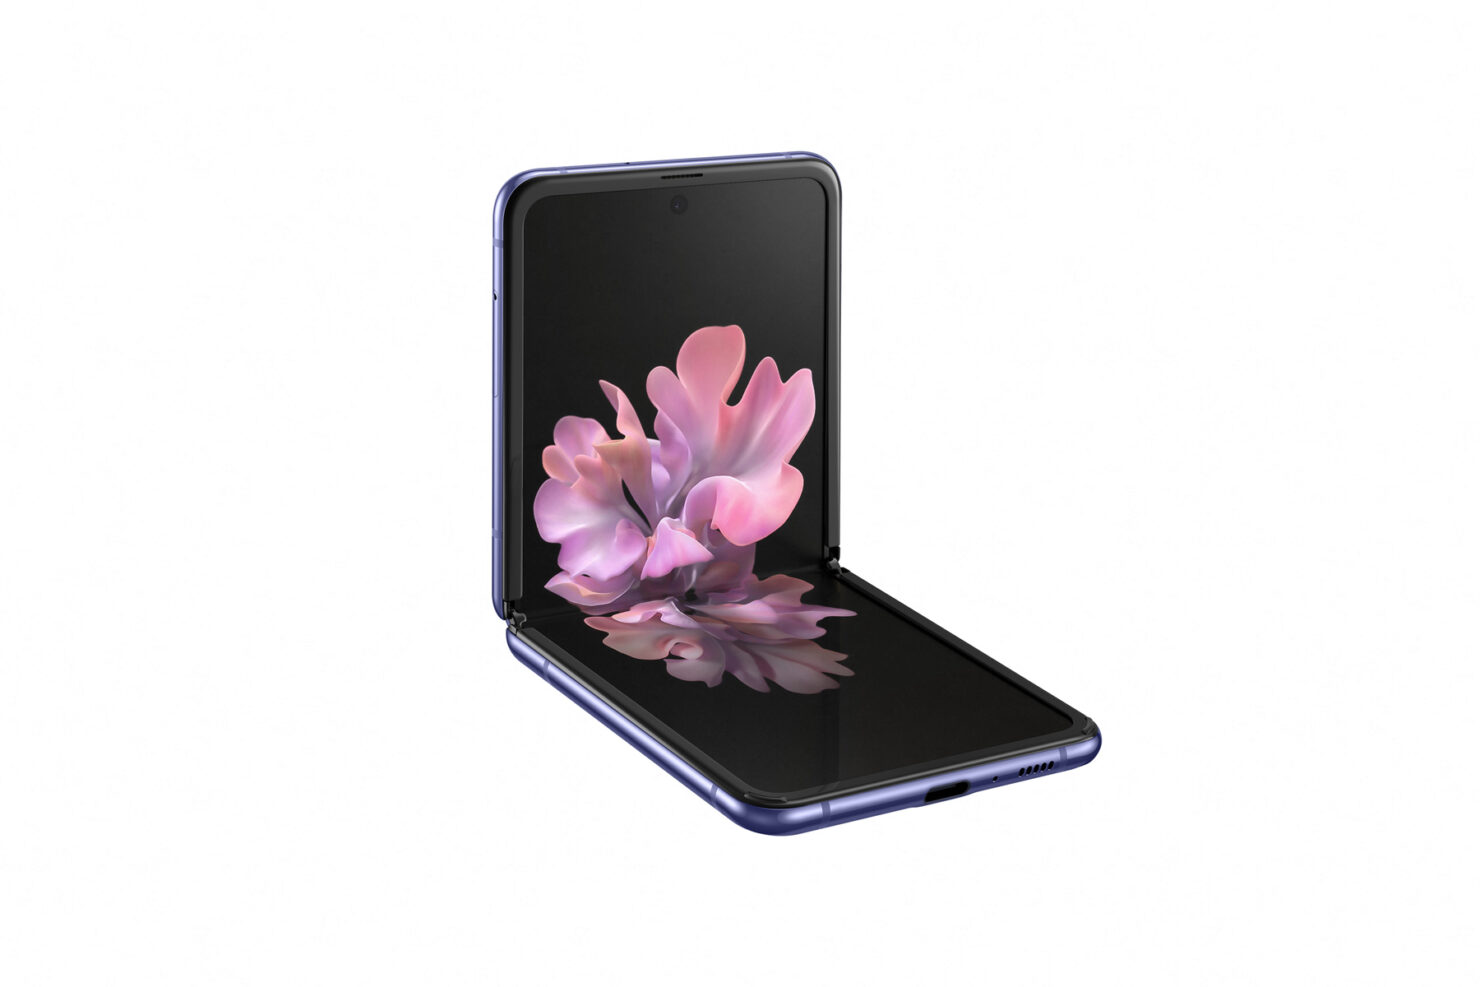 005_galaxyzflip_mirror_purple_l30_table_top